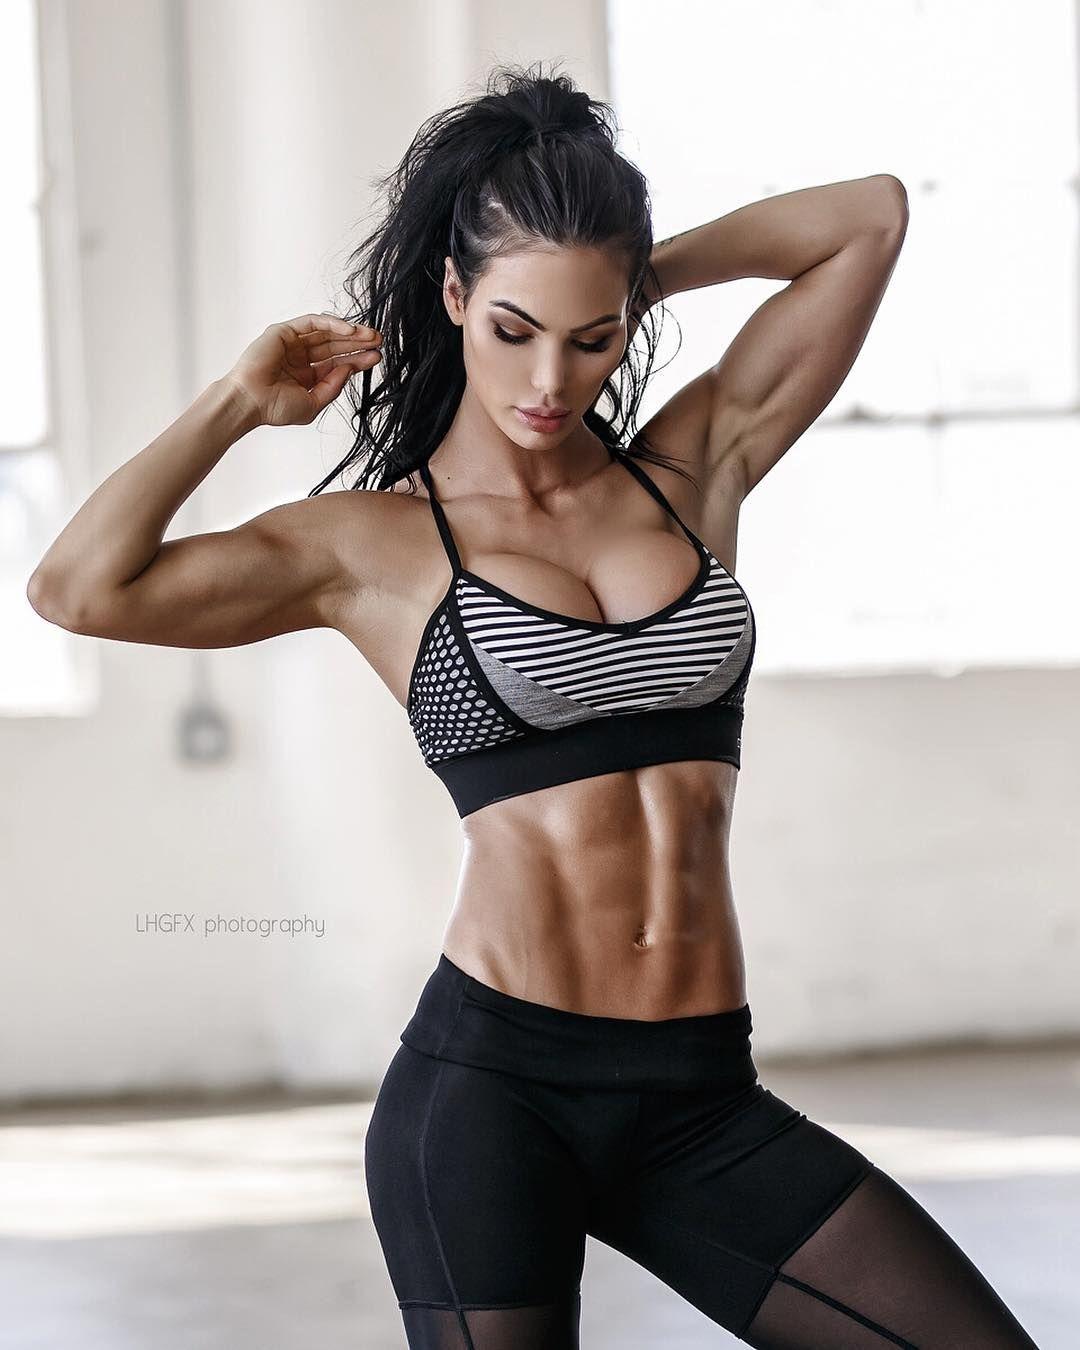 Katelyn Runck - katelyn_runck | #compready2 | Fitness models, Fitness, Fit women